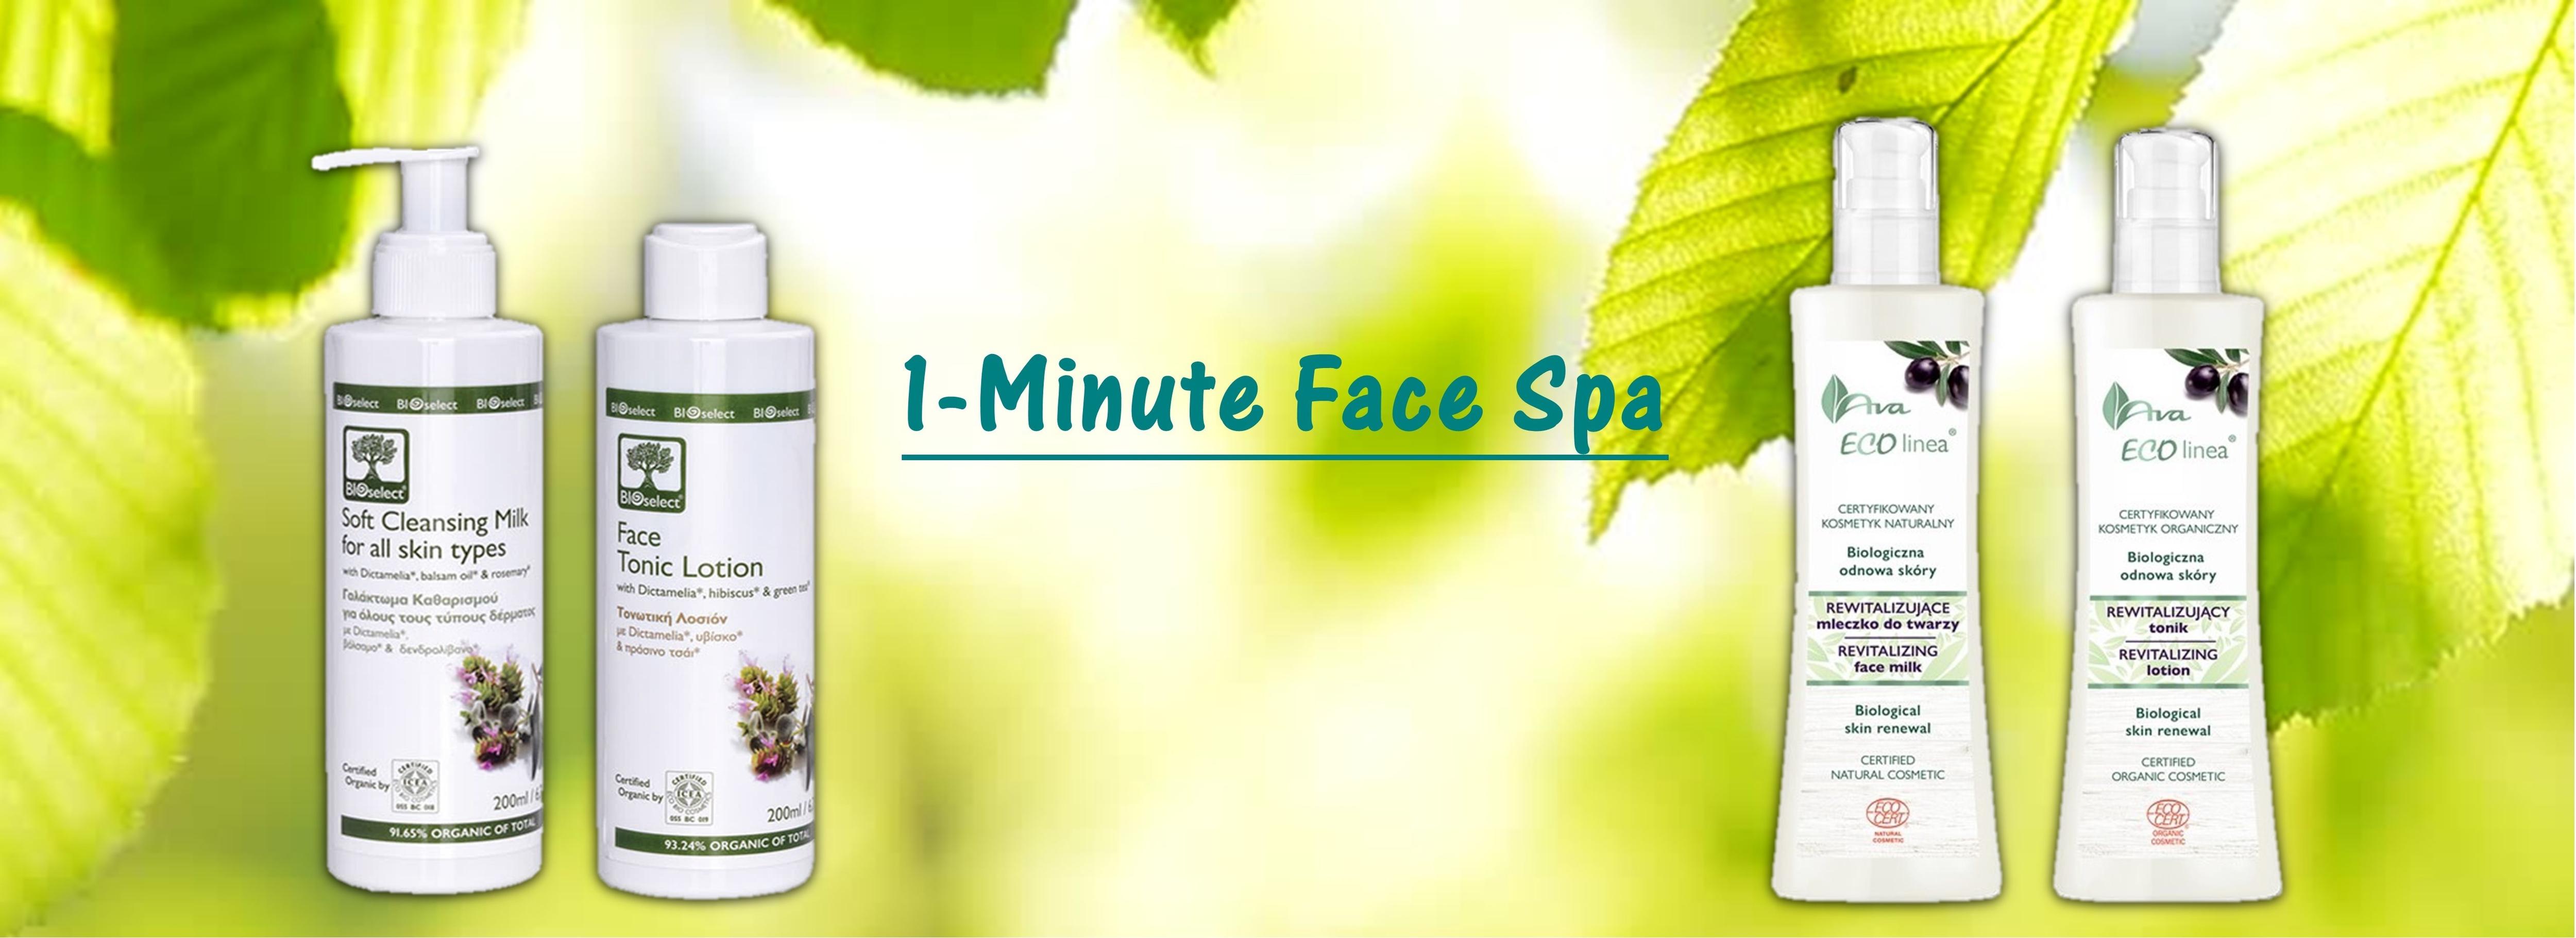 organic skincare, natural skincare, certified organic, organic face cleansing milk, organic toner, organic make-up remover